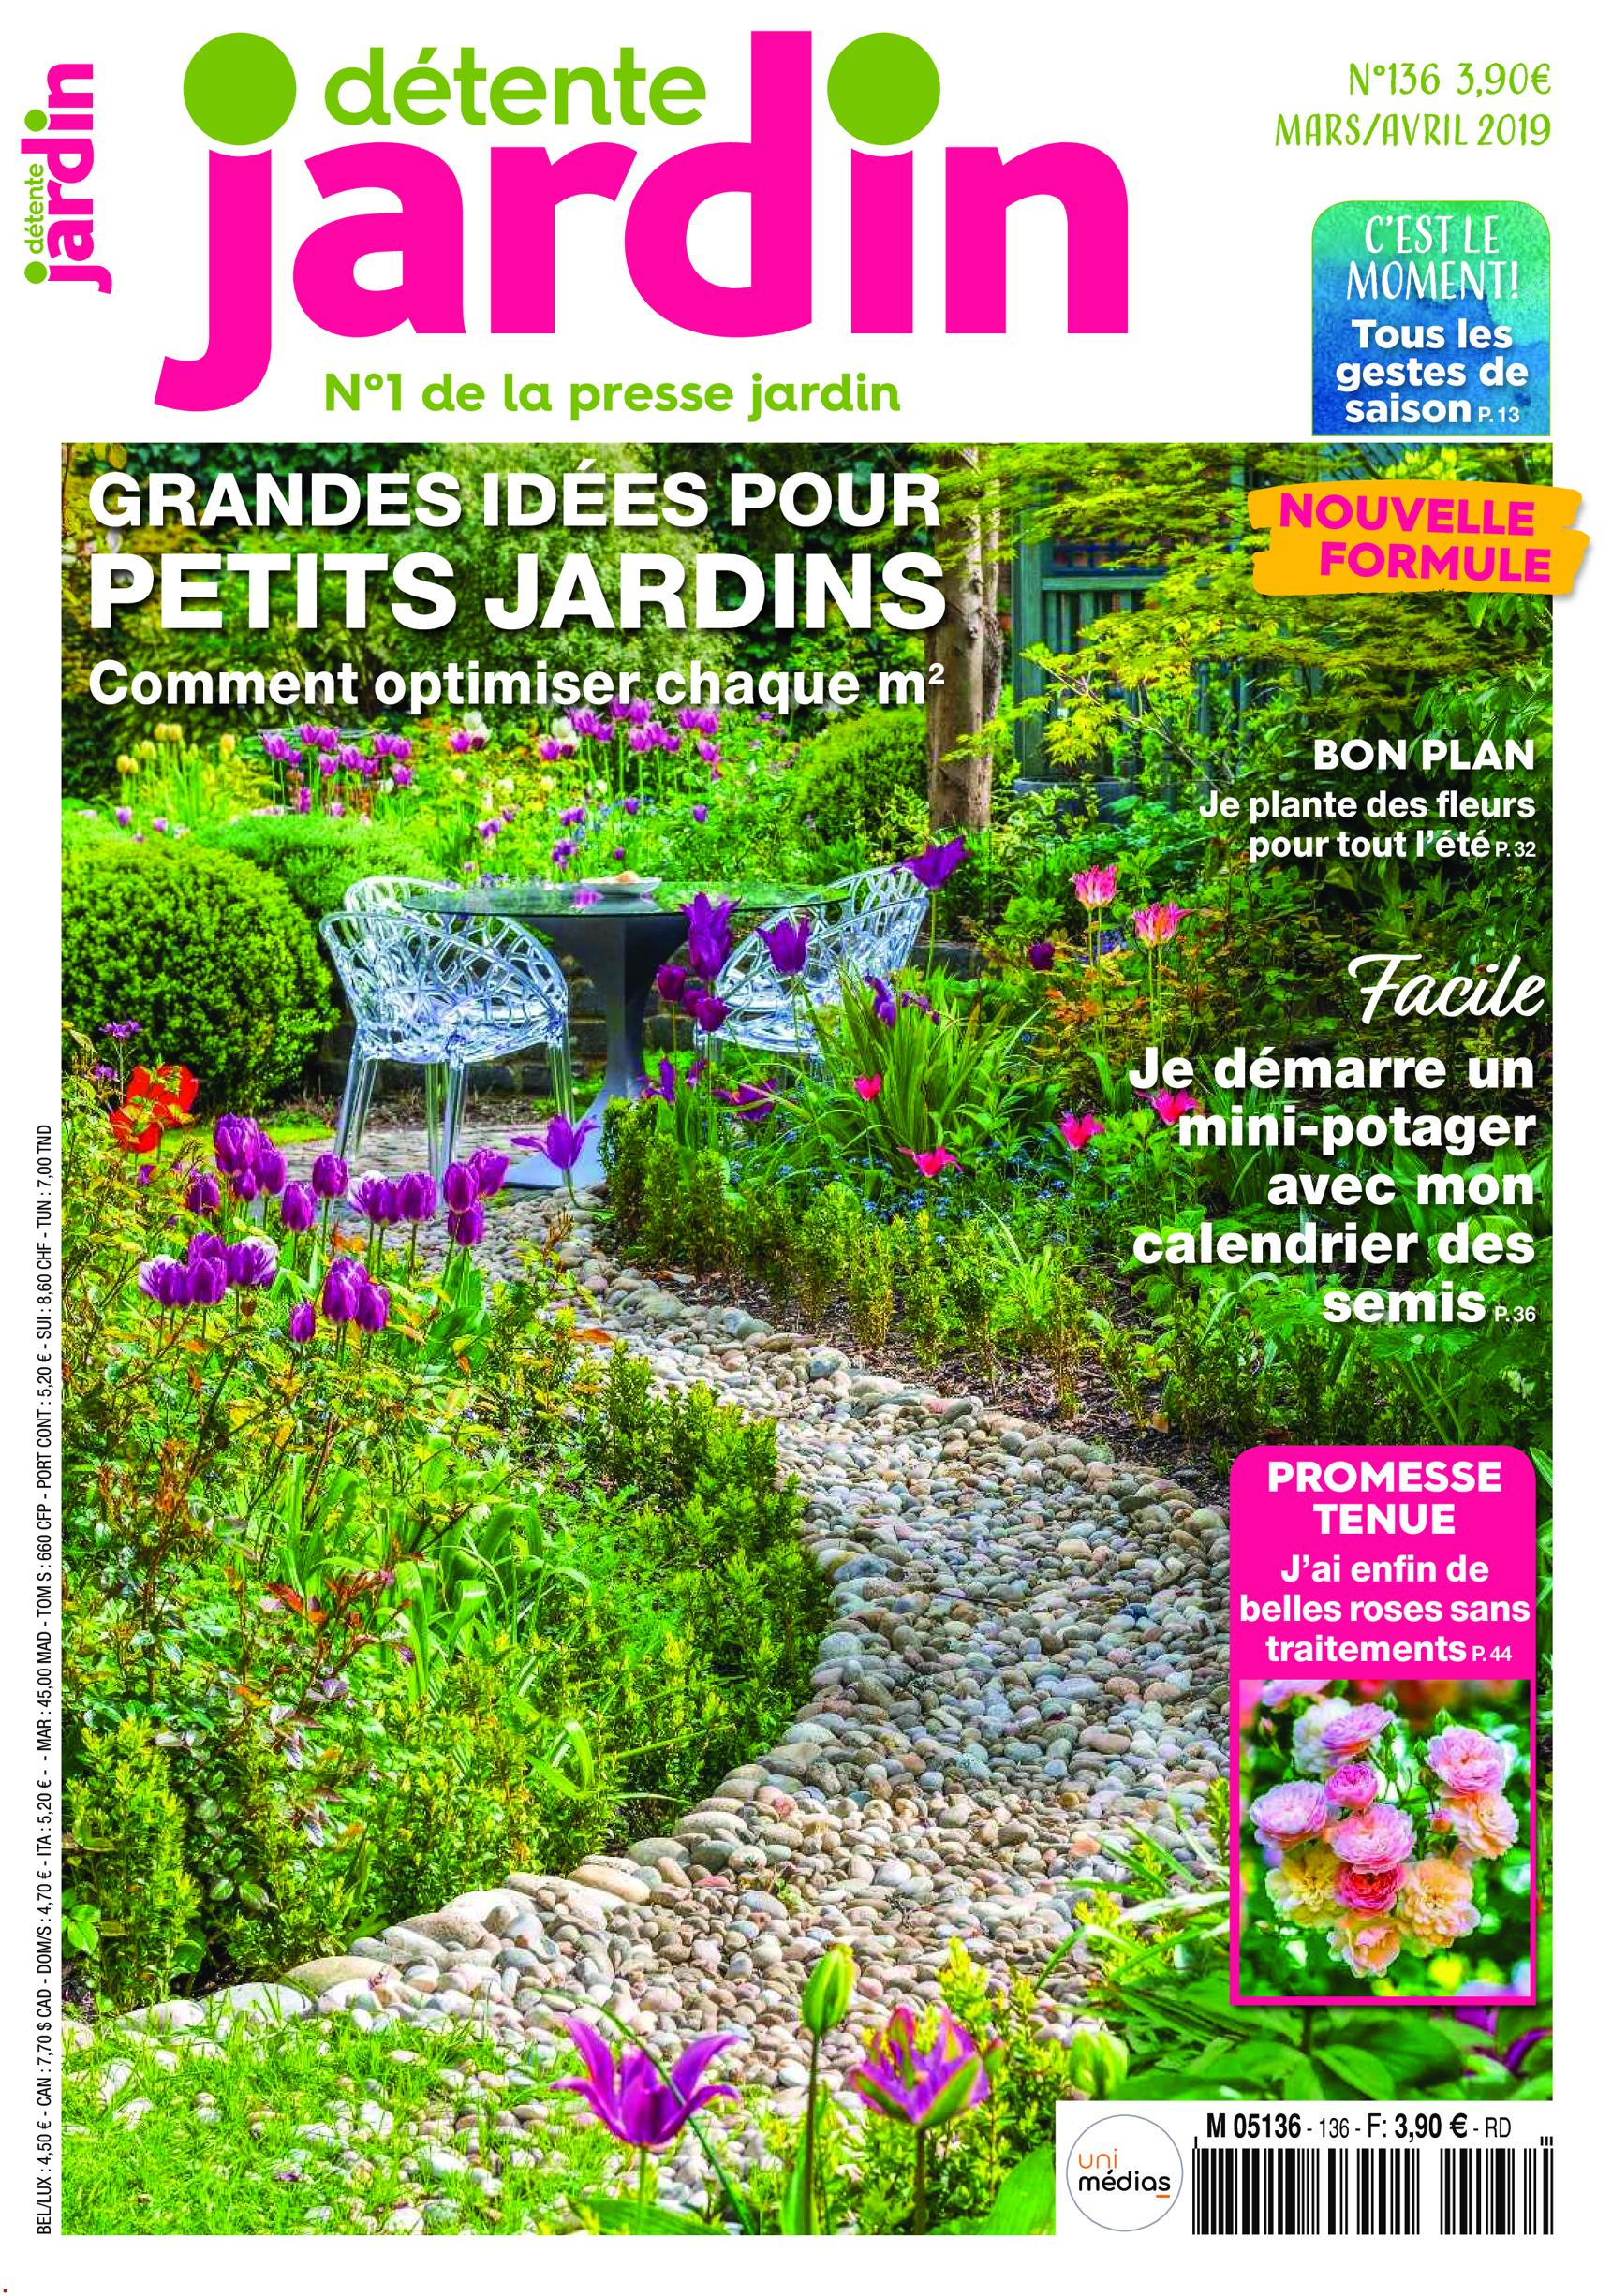 Détente Jardin - Mars/avril 2019 » Free Pdf Magazines For ... destiné Détente Jardin Magazine